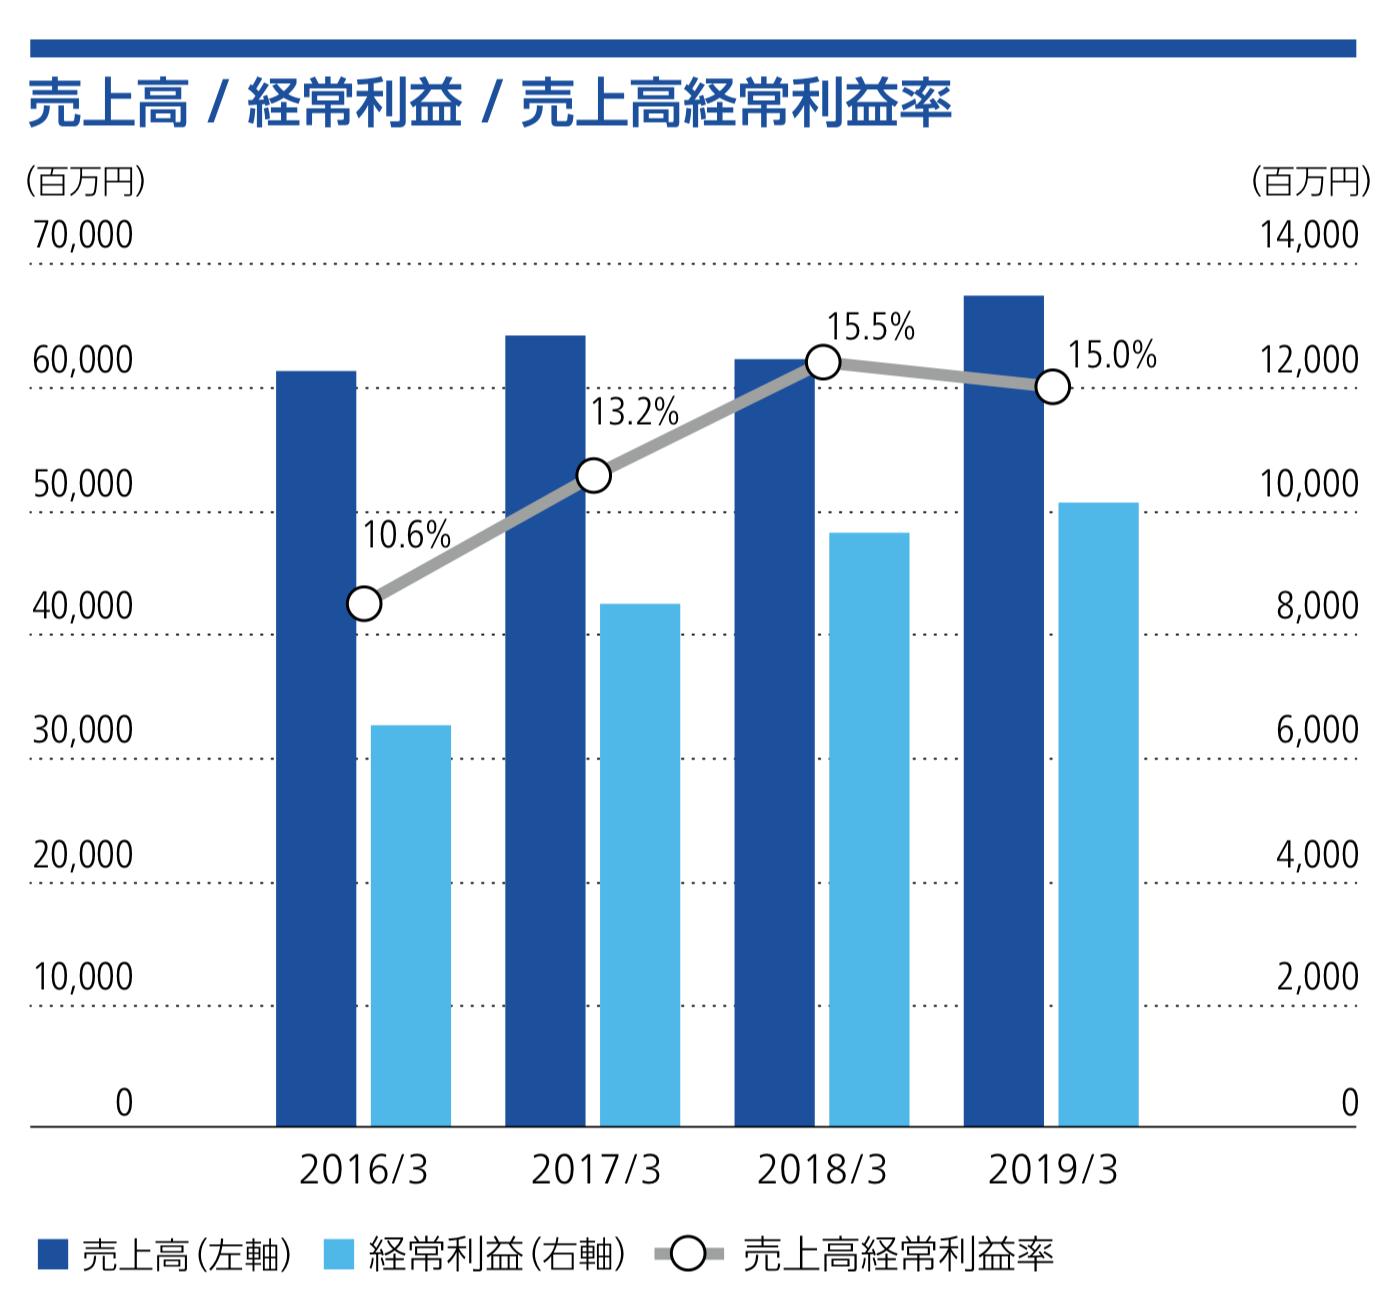 兼松エレクトロニクス株式会社 売上高 / 経常利益 / 売上高経常利益率